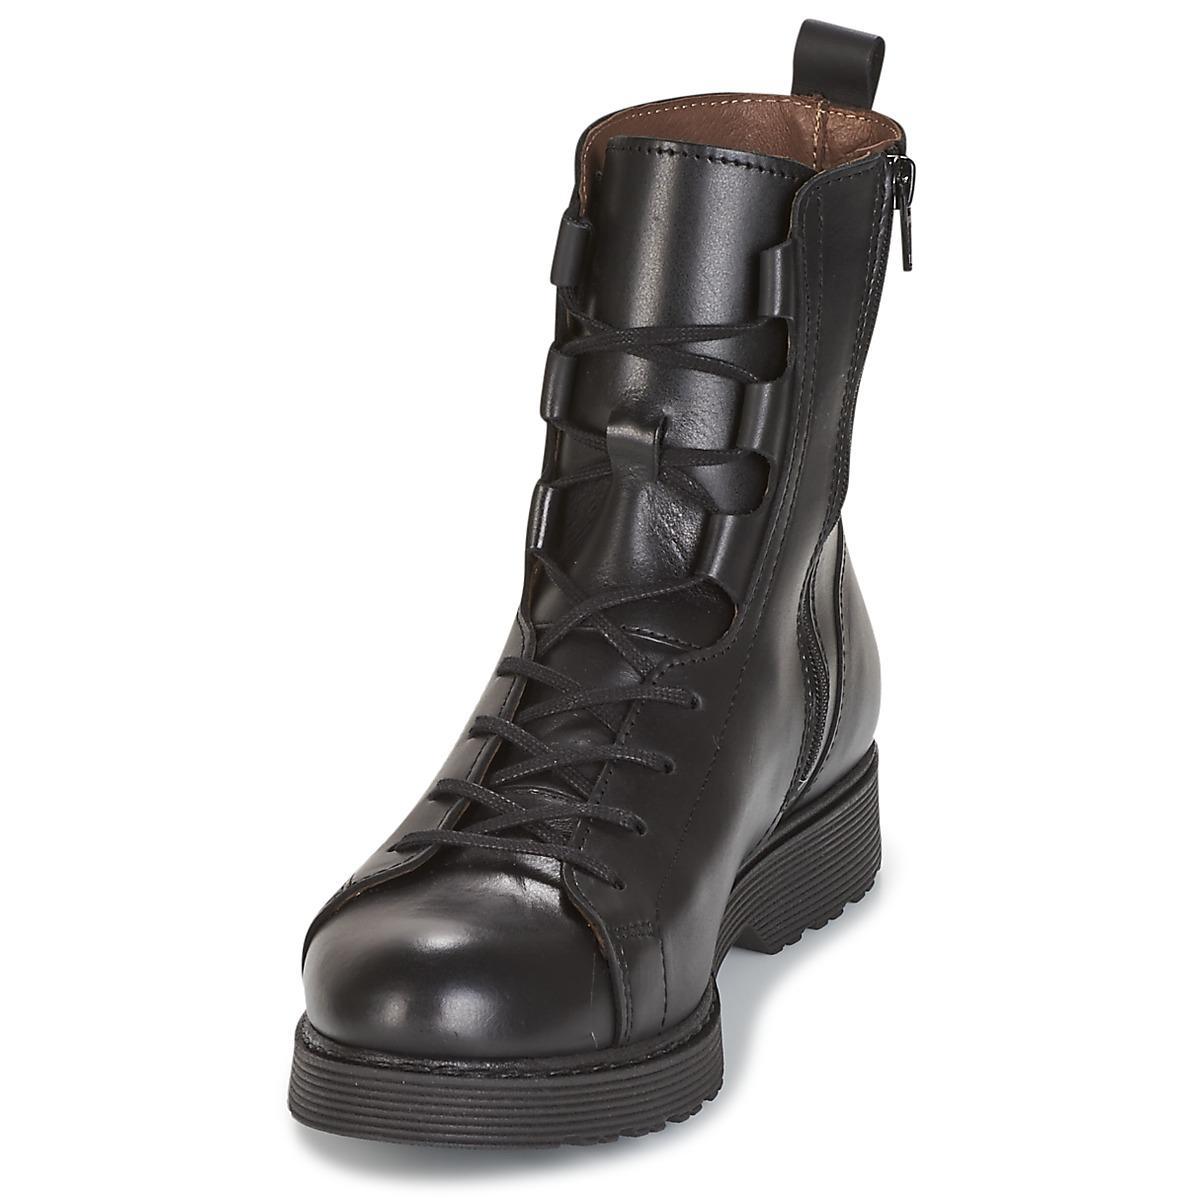 IKKS Leather High Rangers Iskar Women's Mid Boots In Black